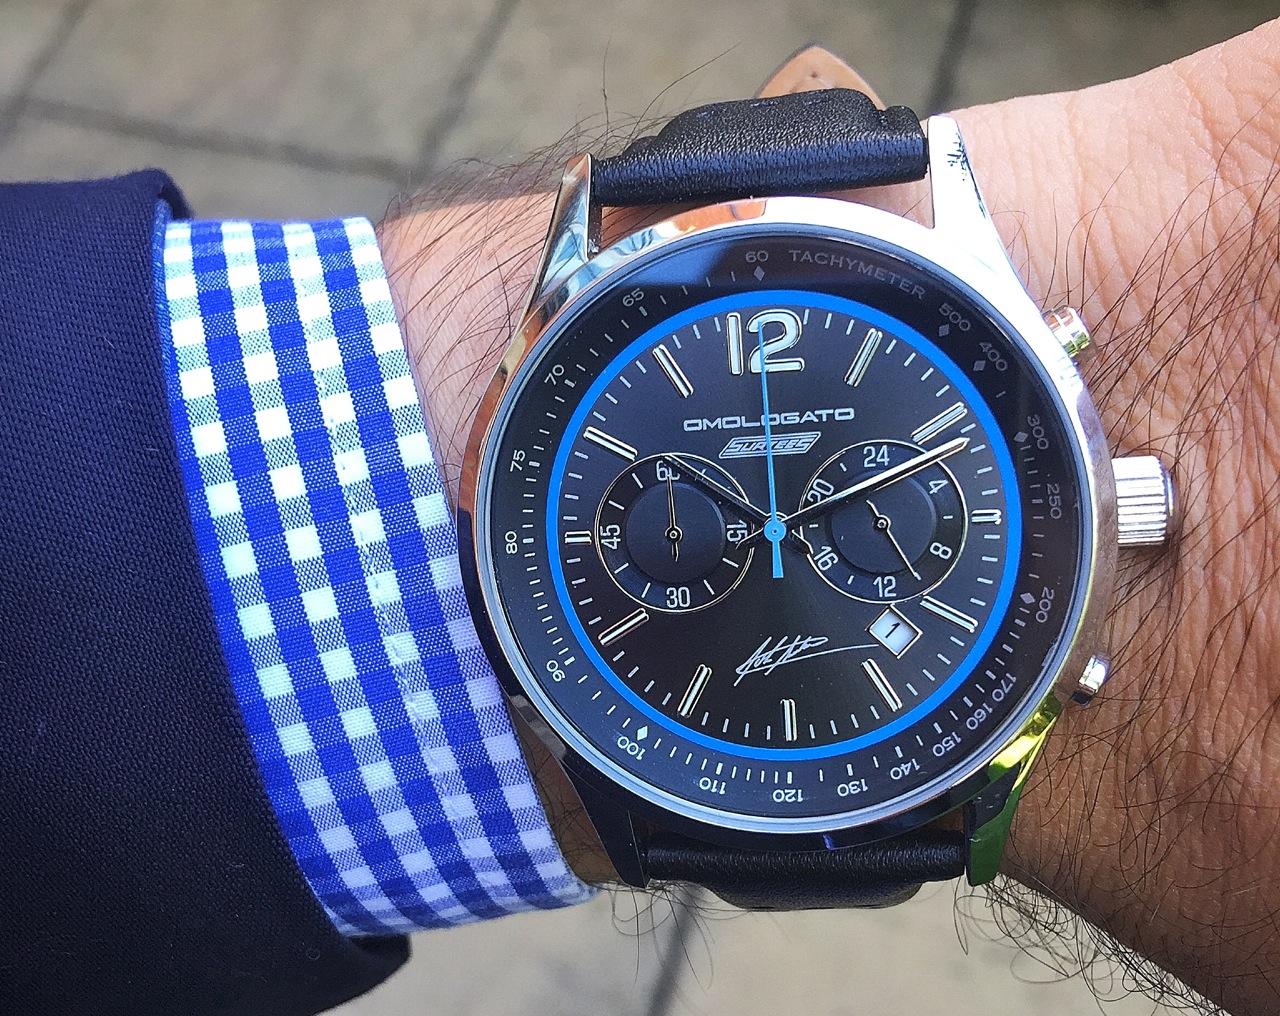 Omologato Chrono John Surtees Cbe Watch